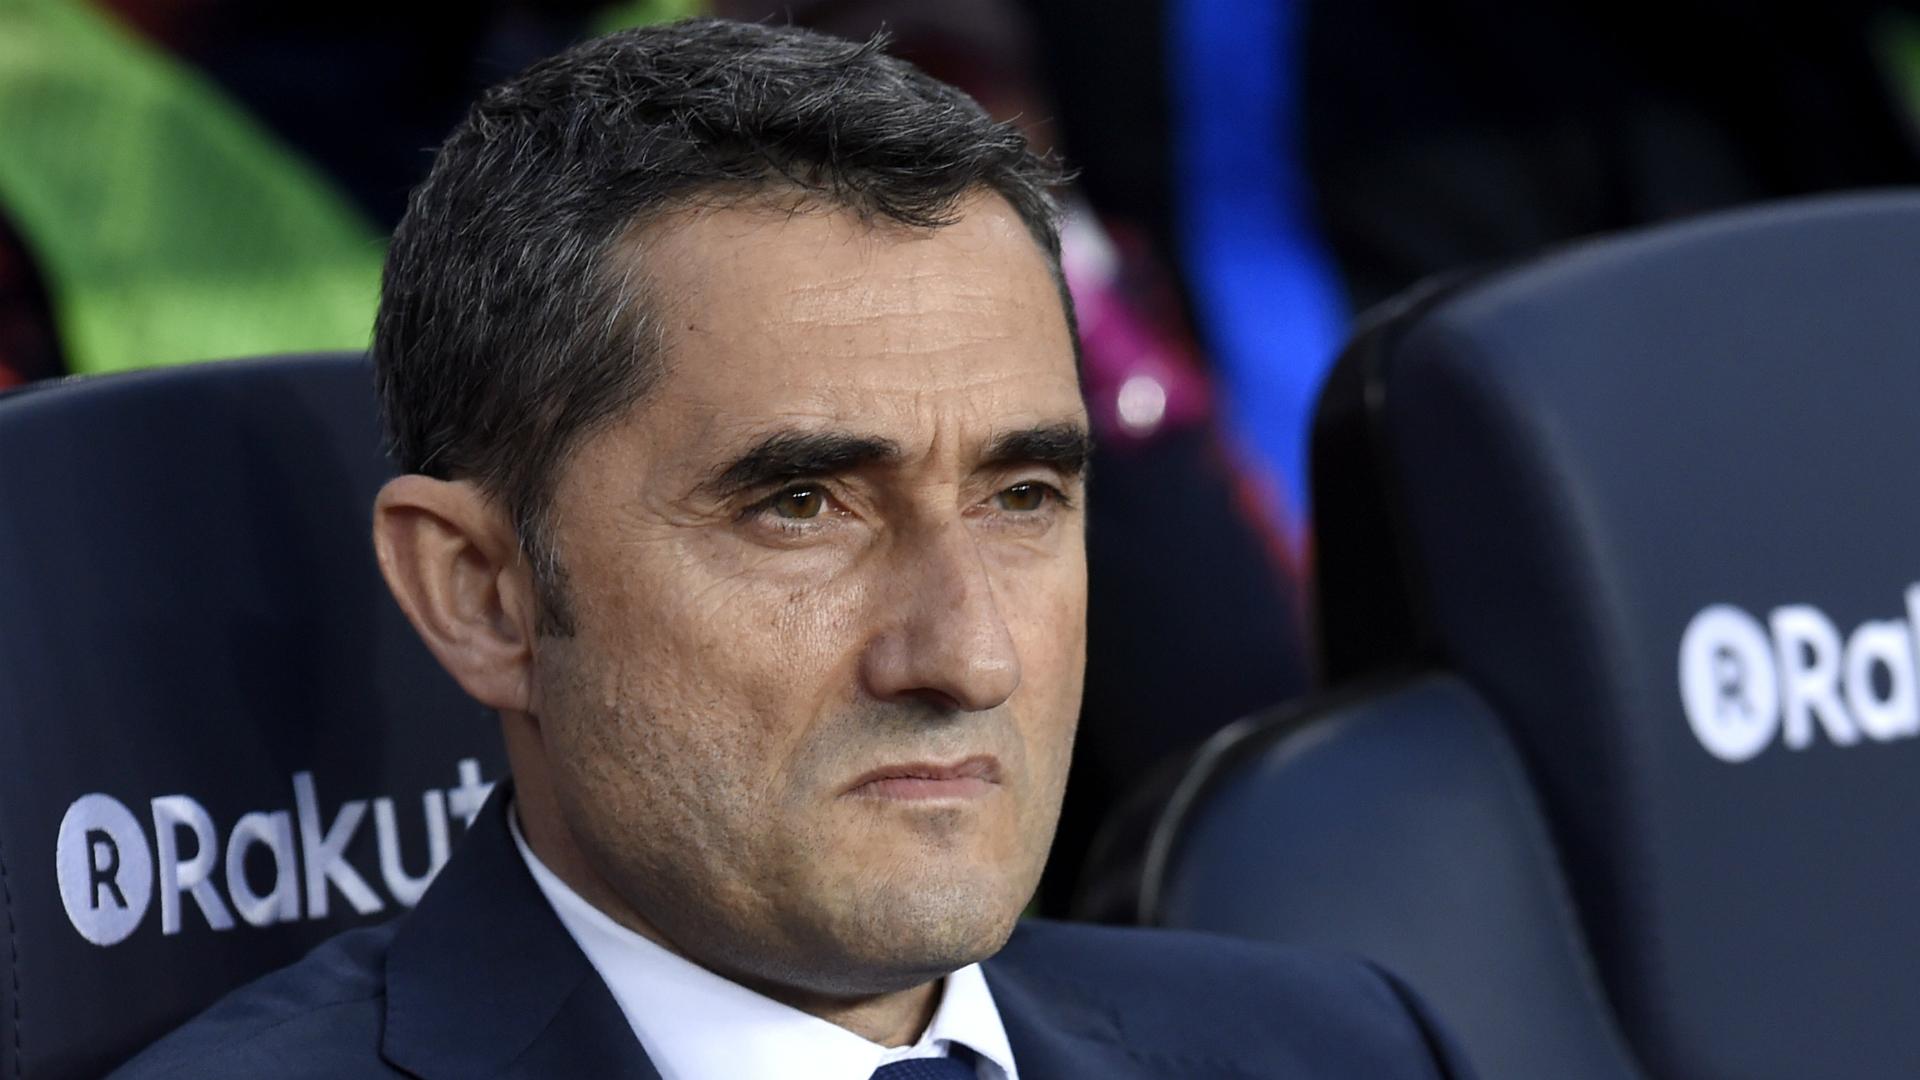 Ernesto Valverde Tak Ingin Bahas Soal Rumor Griezmann